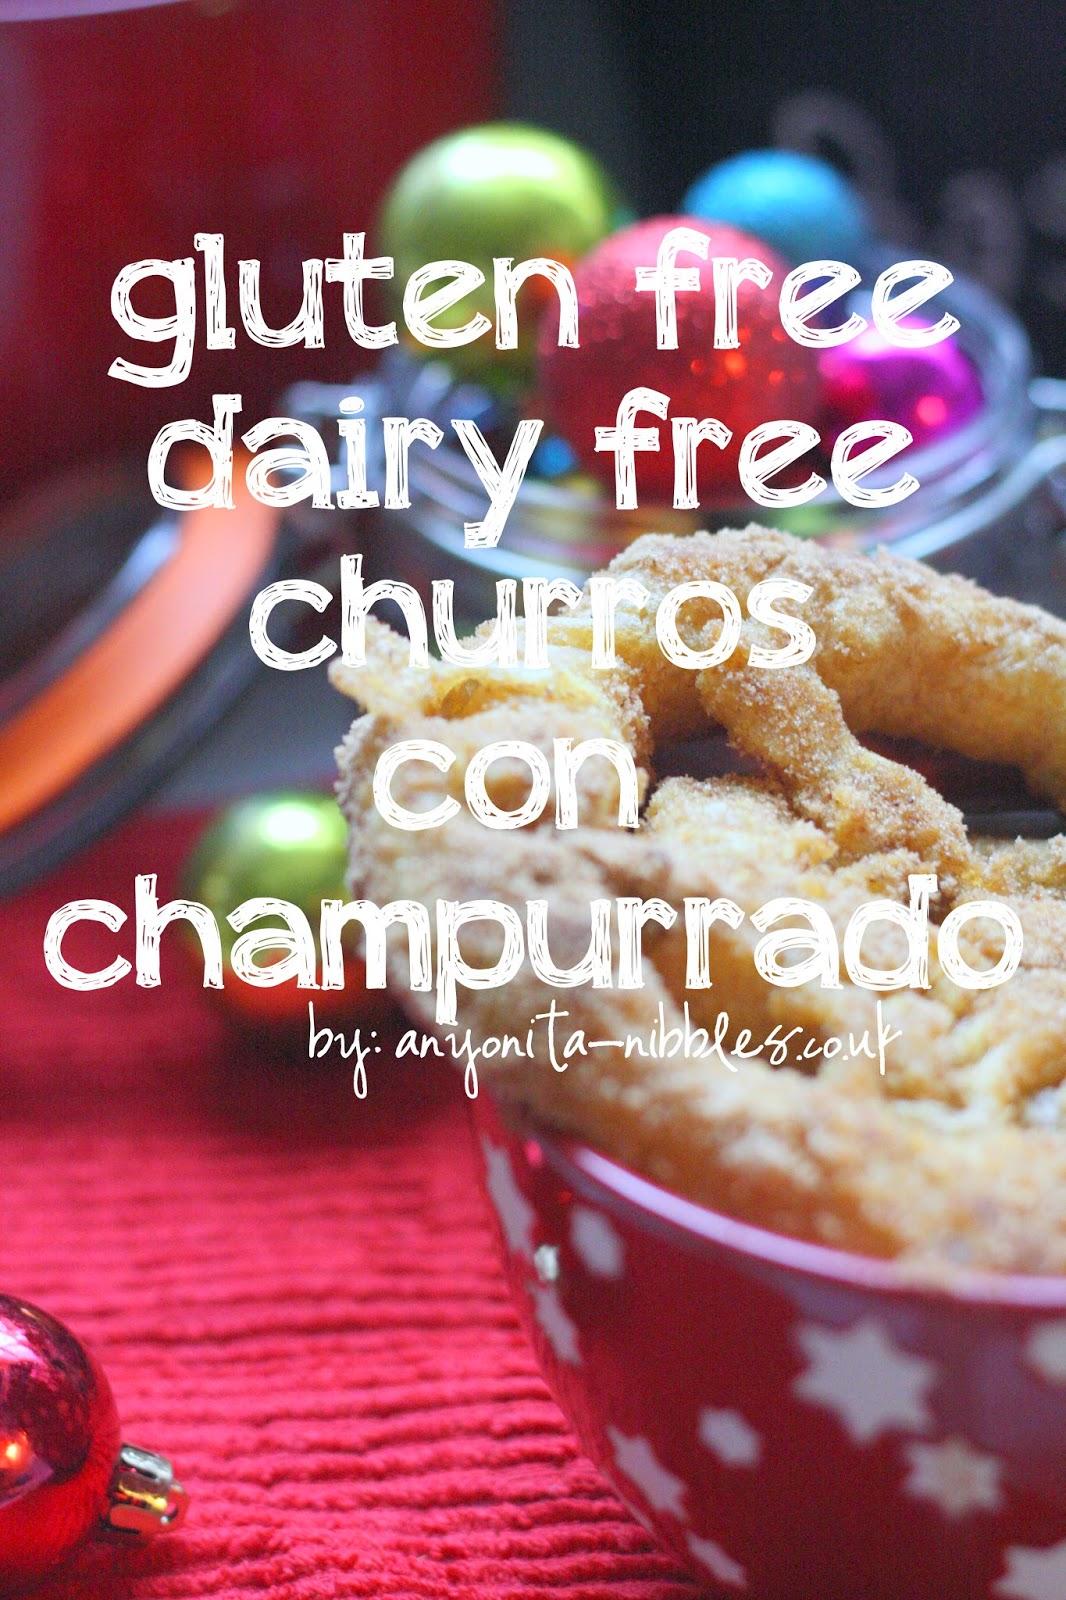 Gluten Free, Dairy Free Churros con Champurrado from Anyonita-nibbles.co.uk